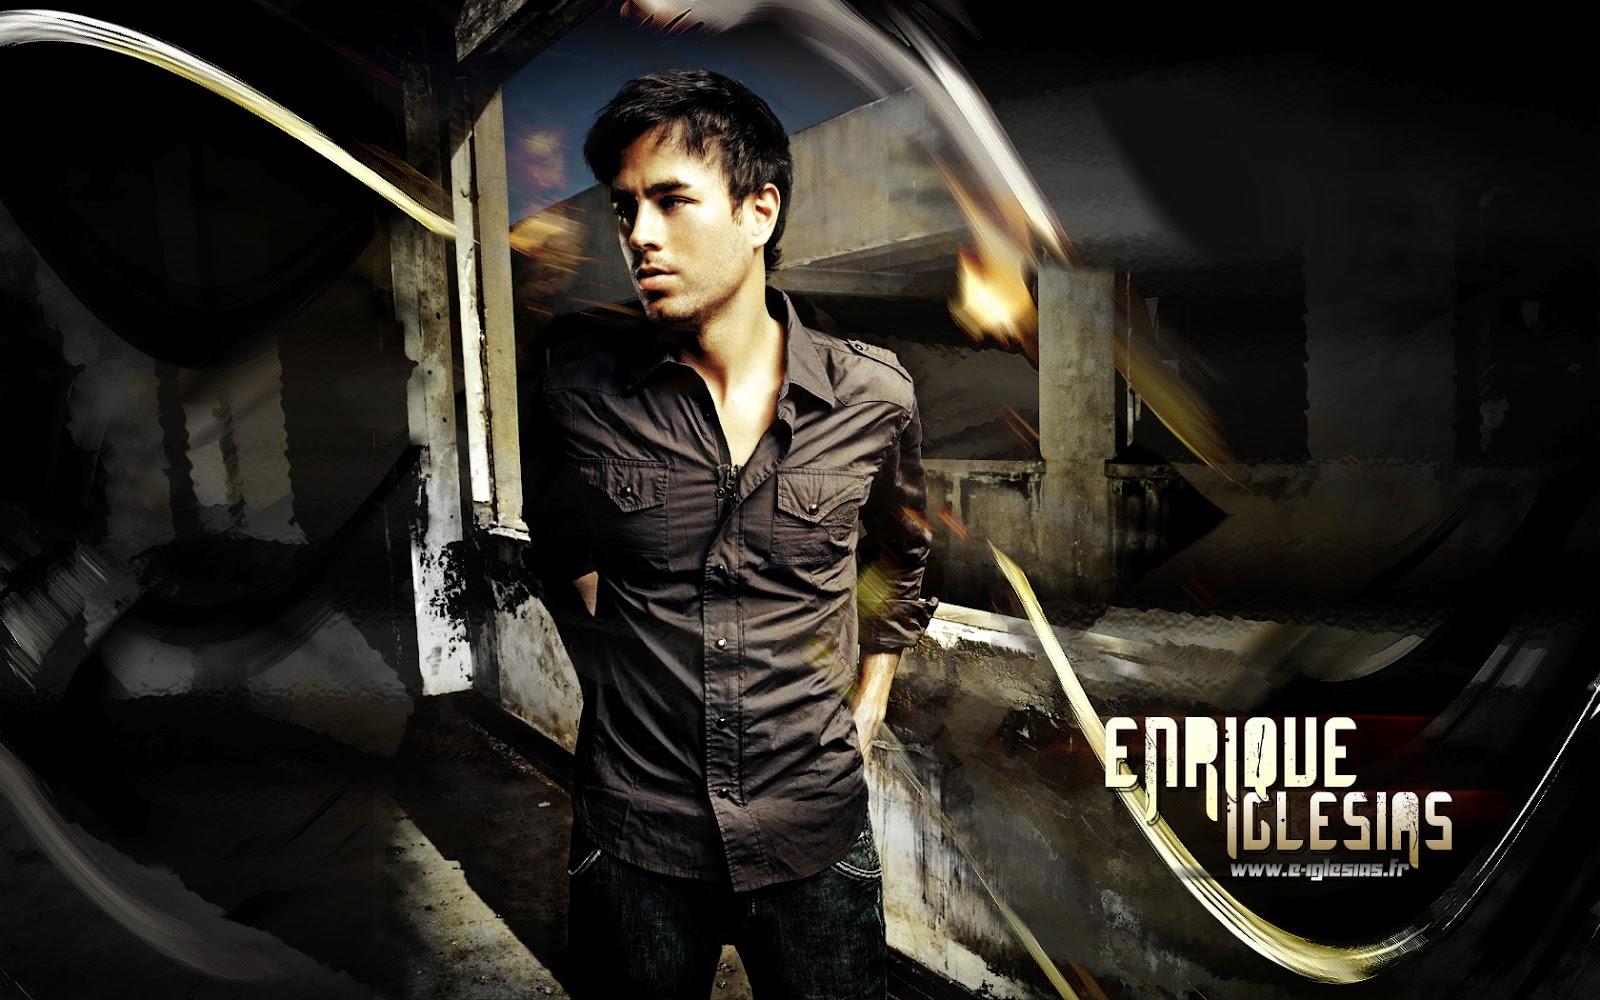 Enrique Iglesias Spanish Songs Free Mp3 Download | 6k pics